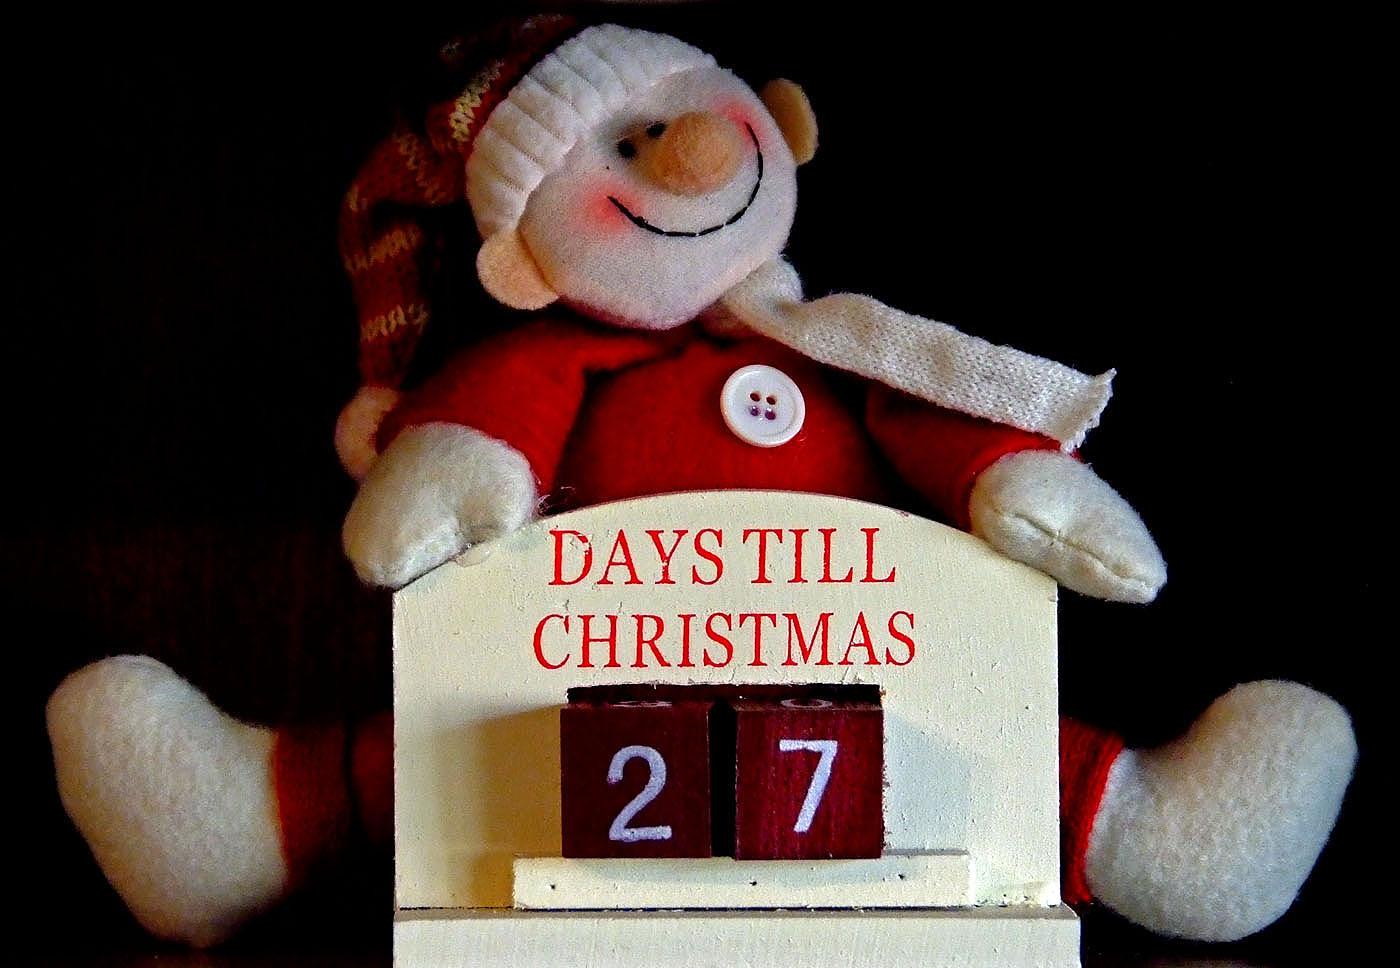 Noch 27 Tage ....